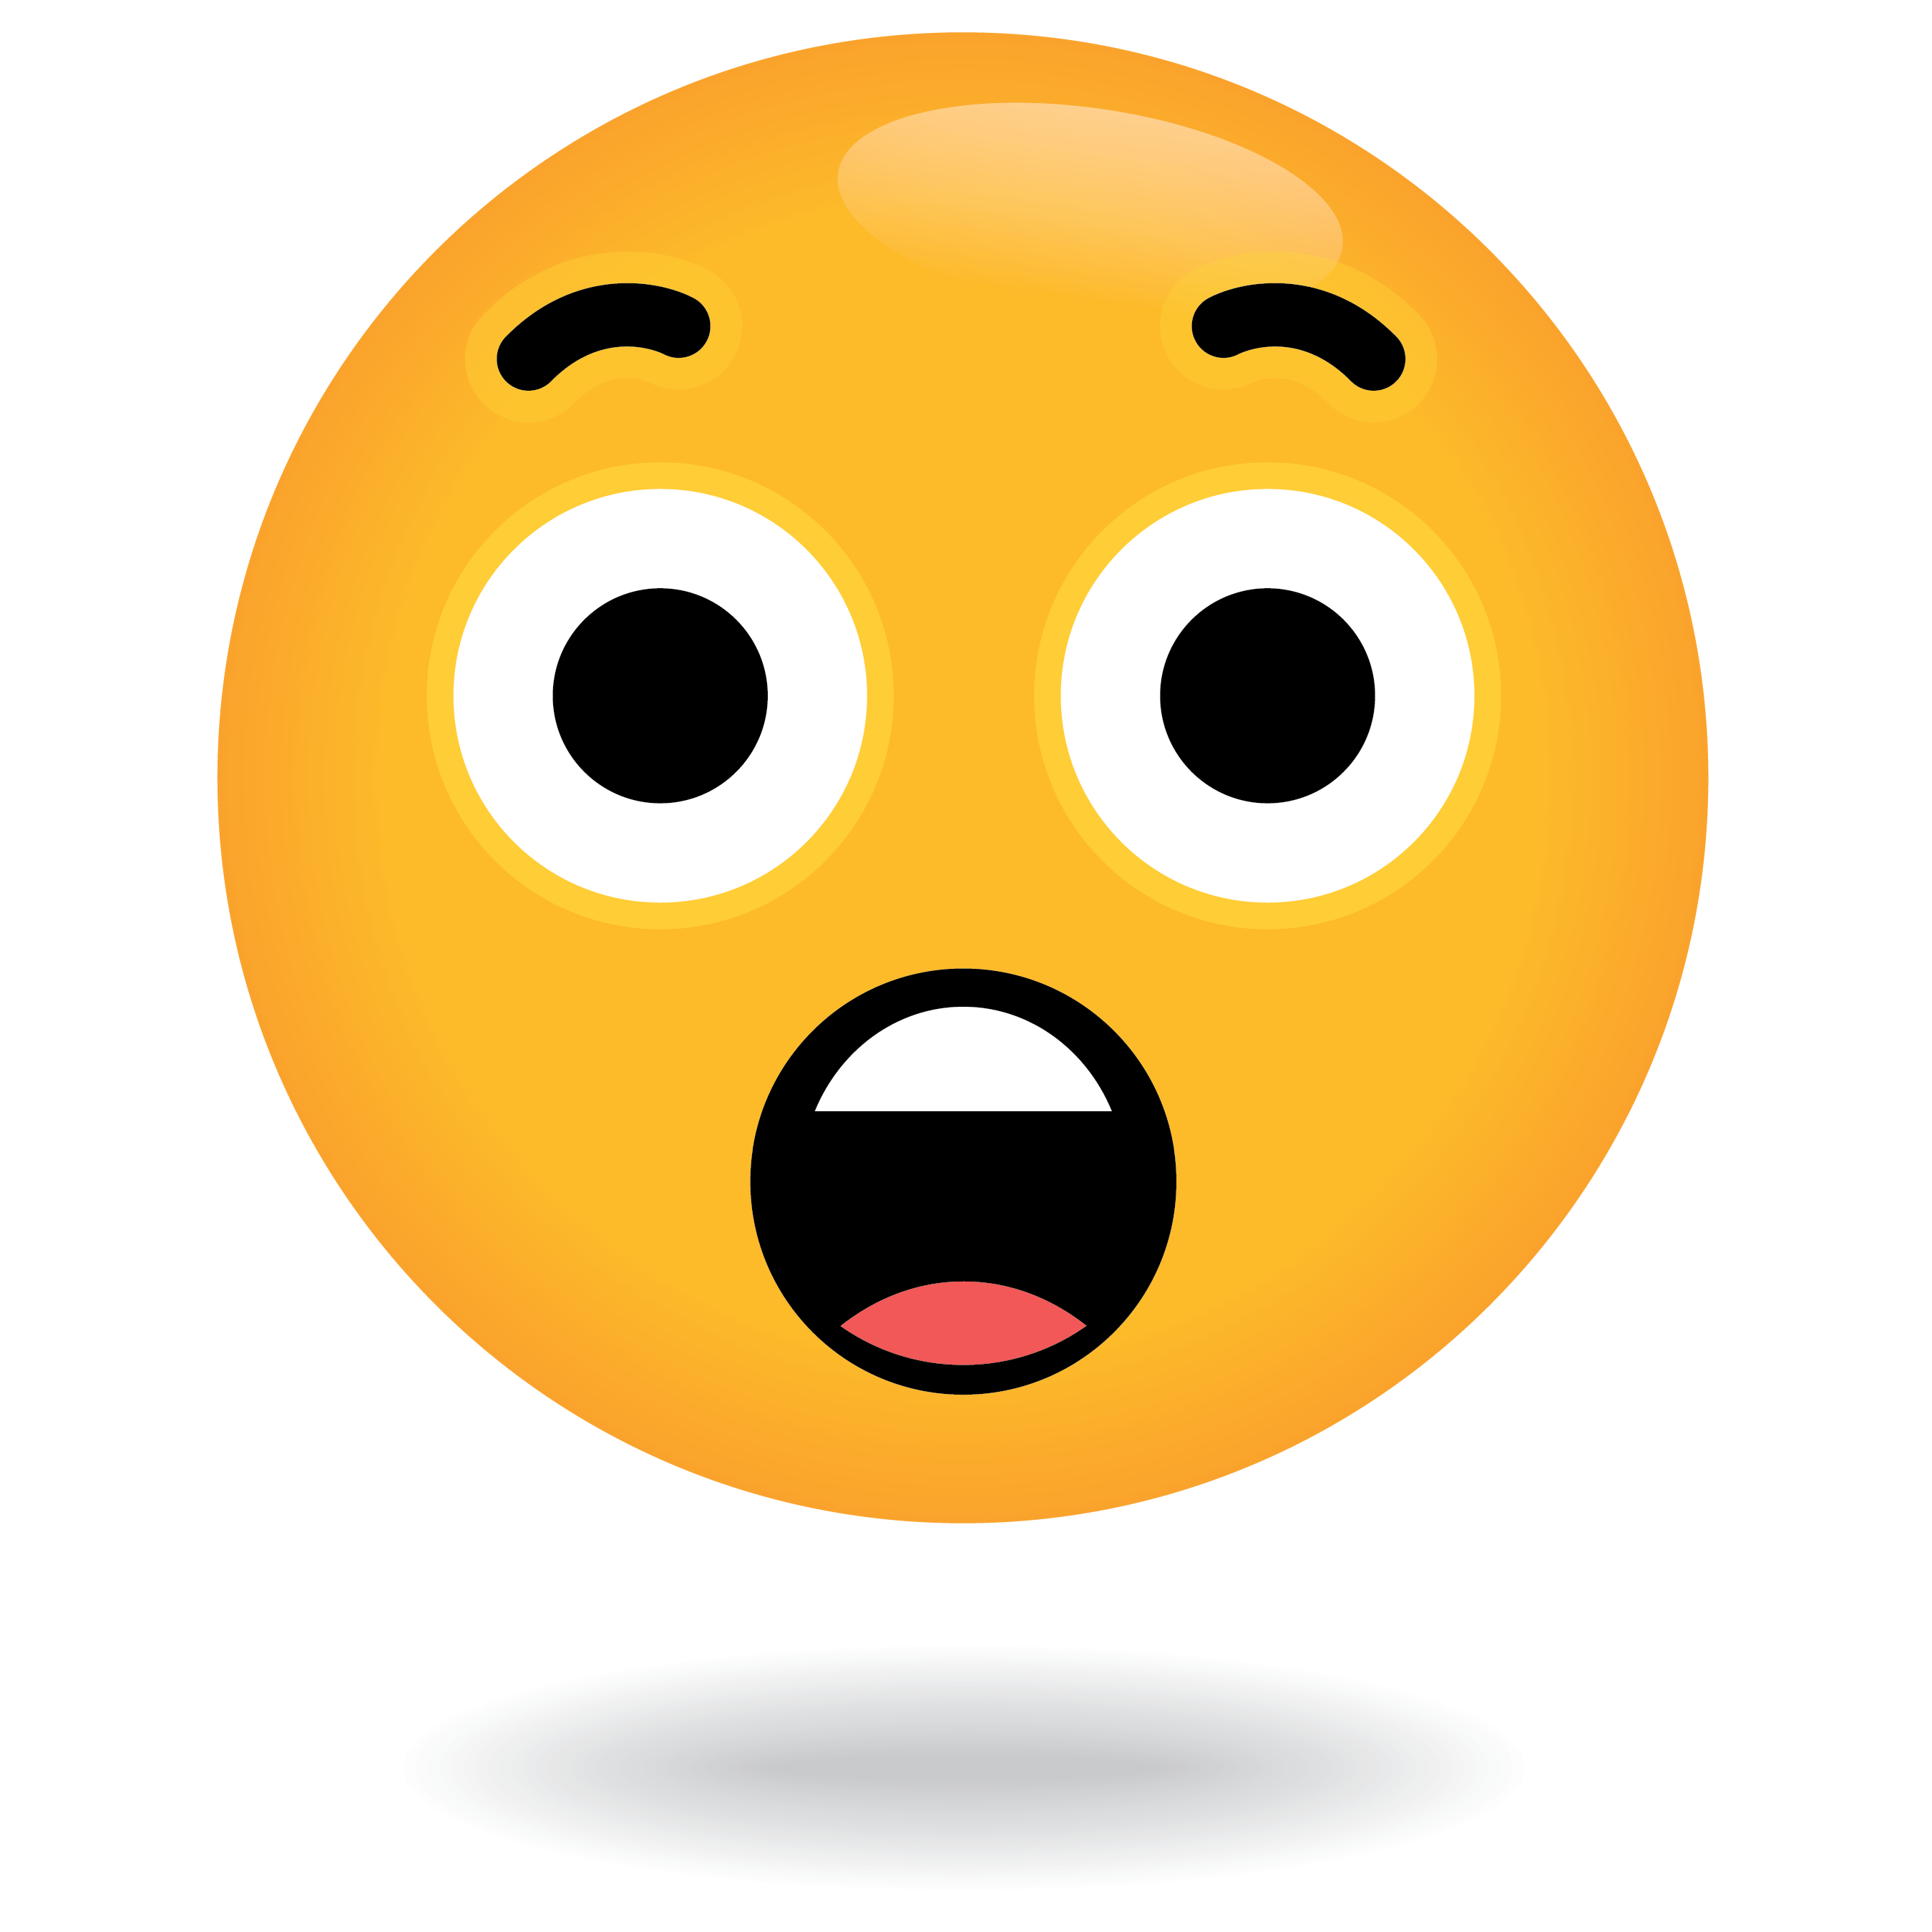 Surprised Emoji by Define Awesome